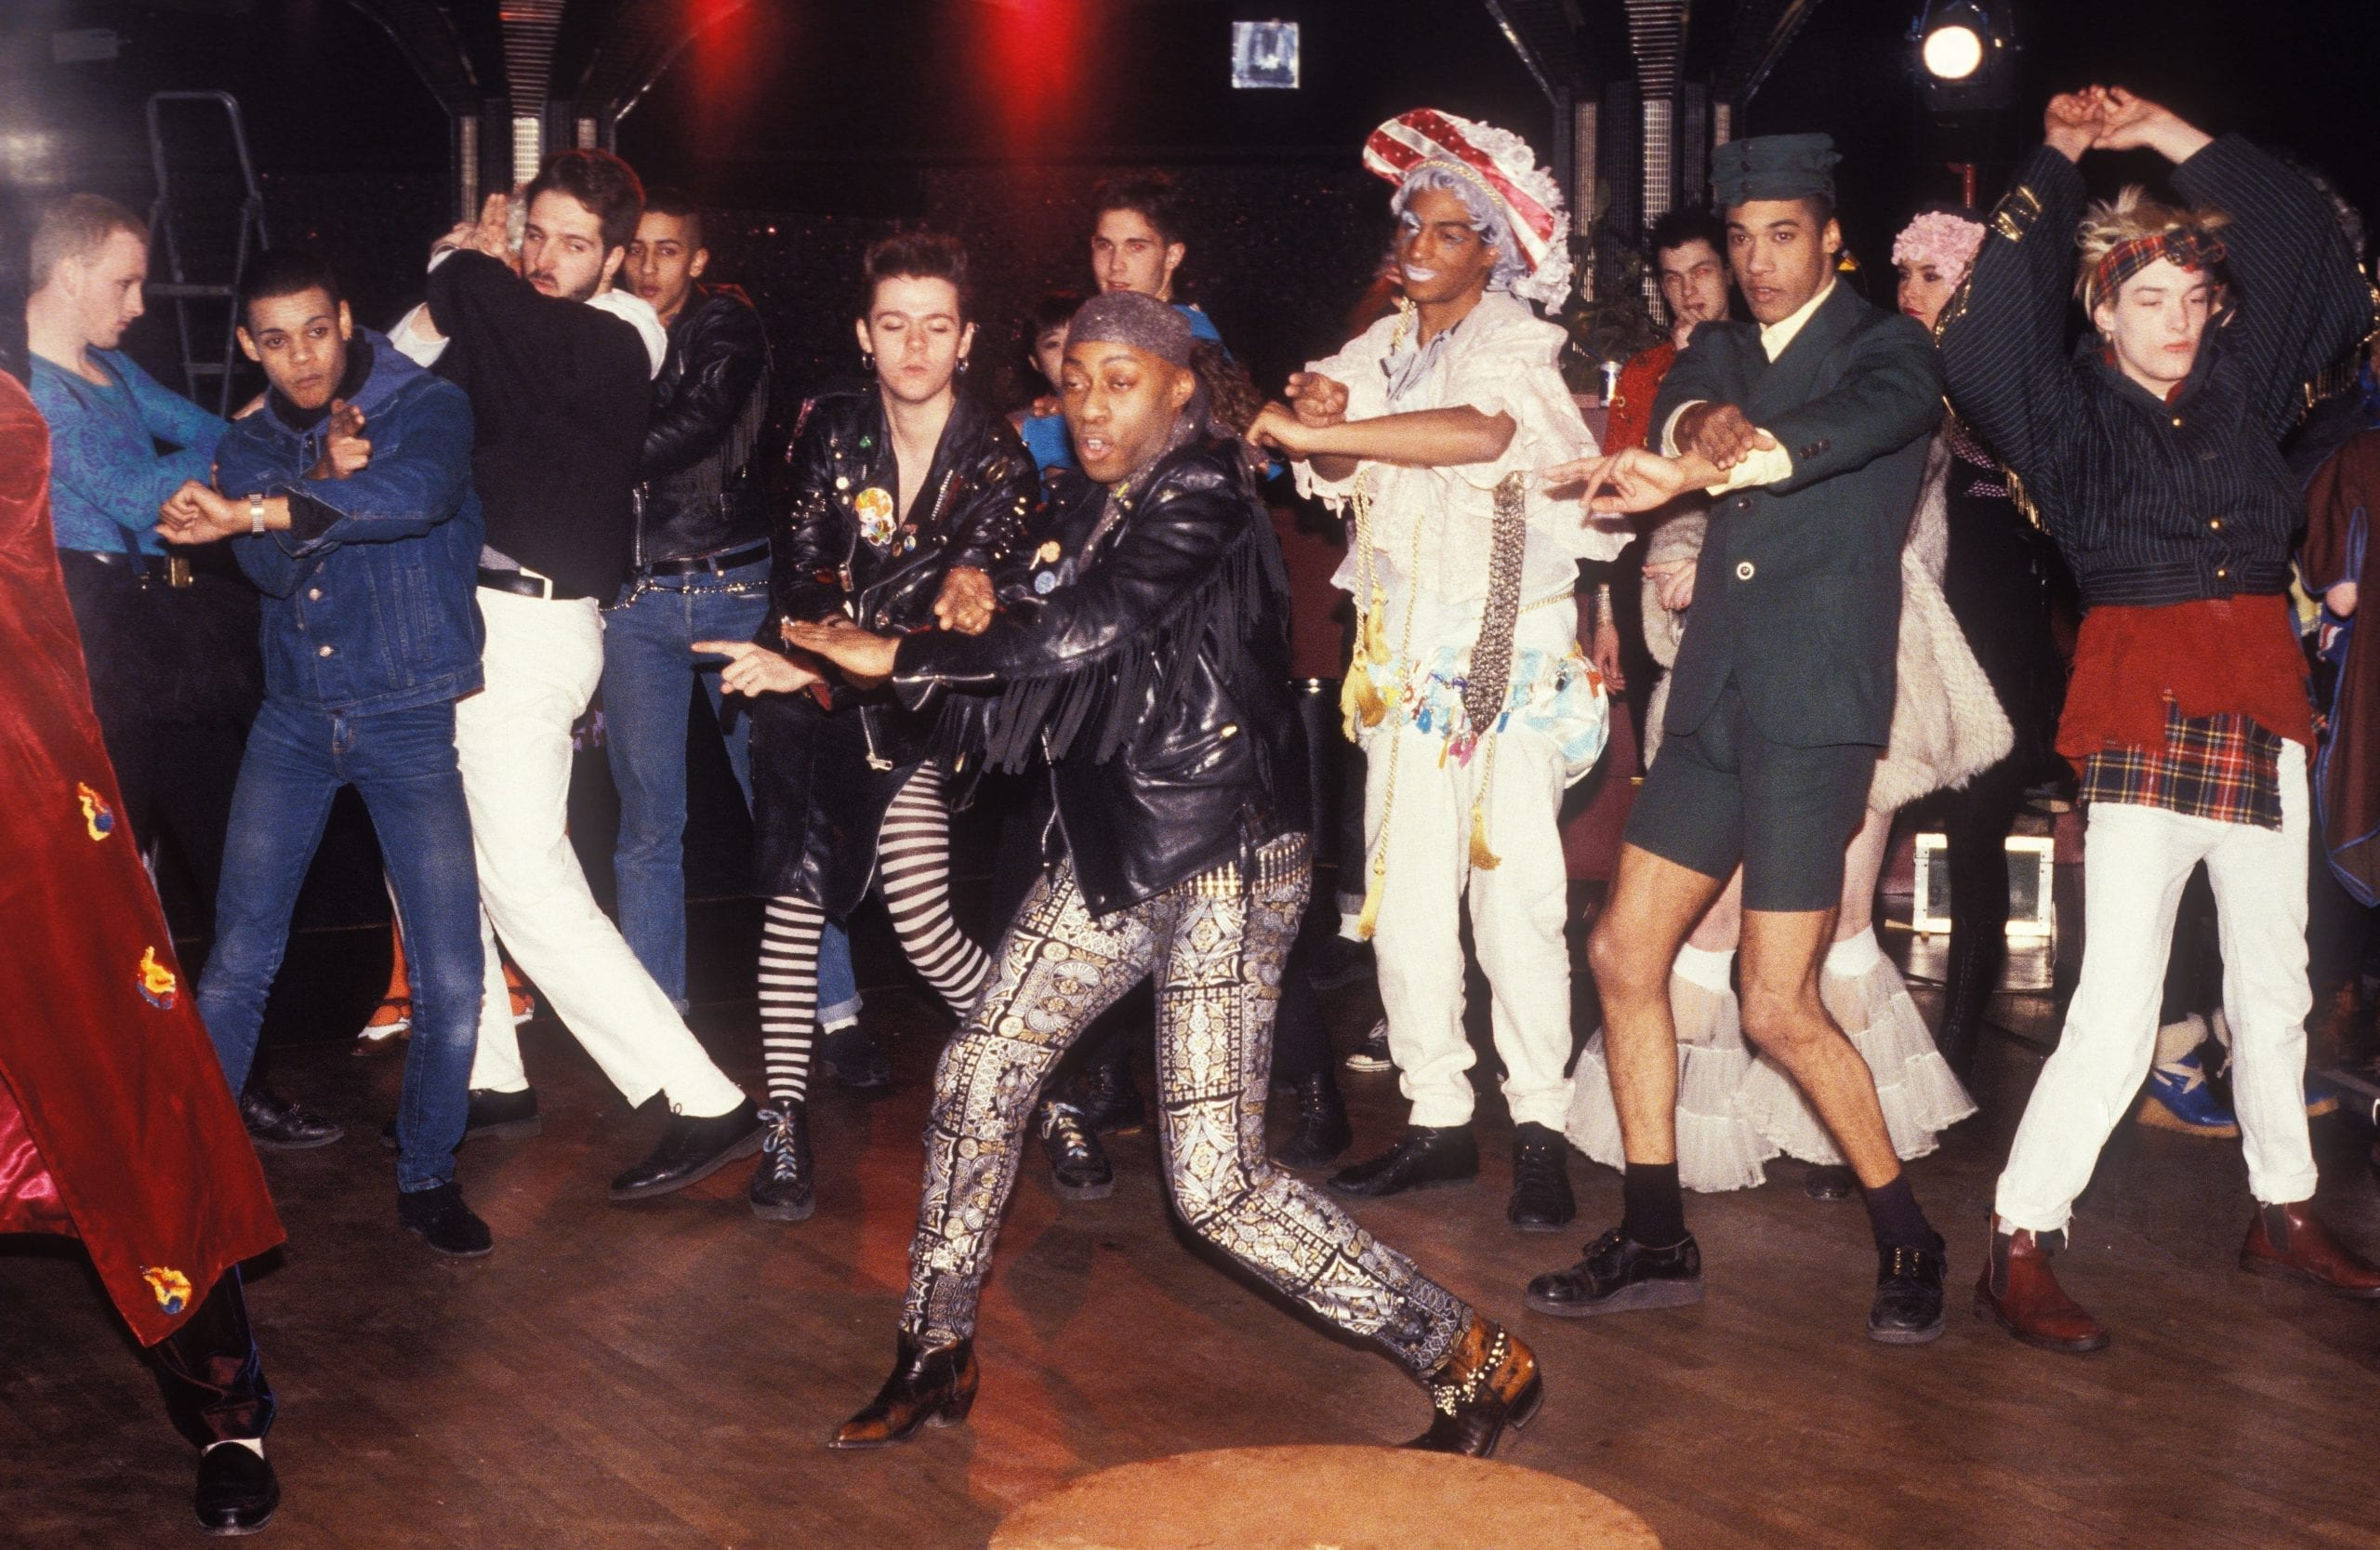 Clubbers dancing at Leigh Bowery's club Taboo, London, UK, 1986 © Hartnett/PYMCA